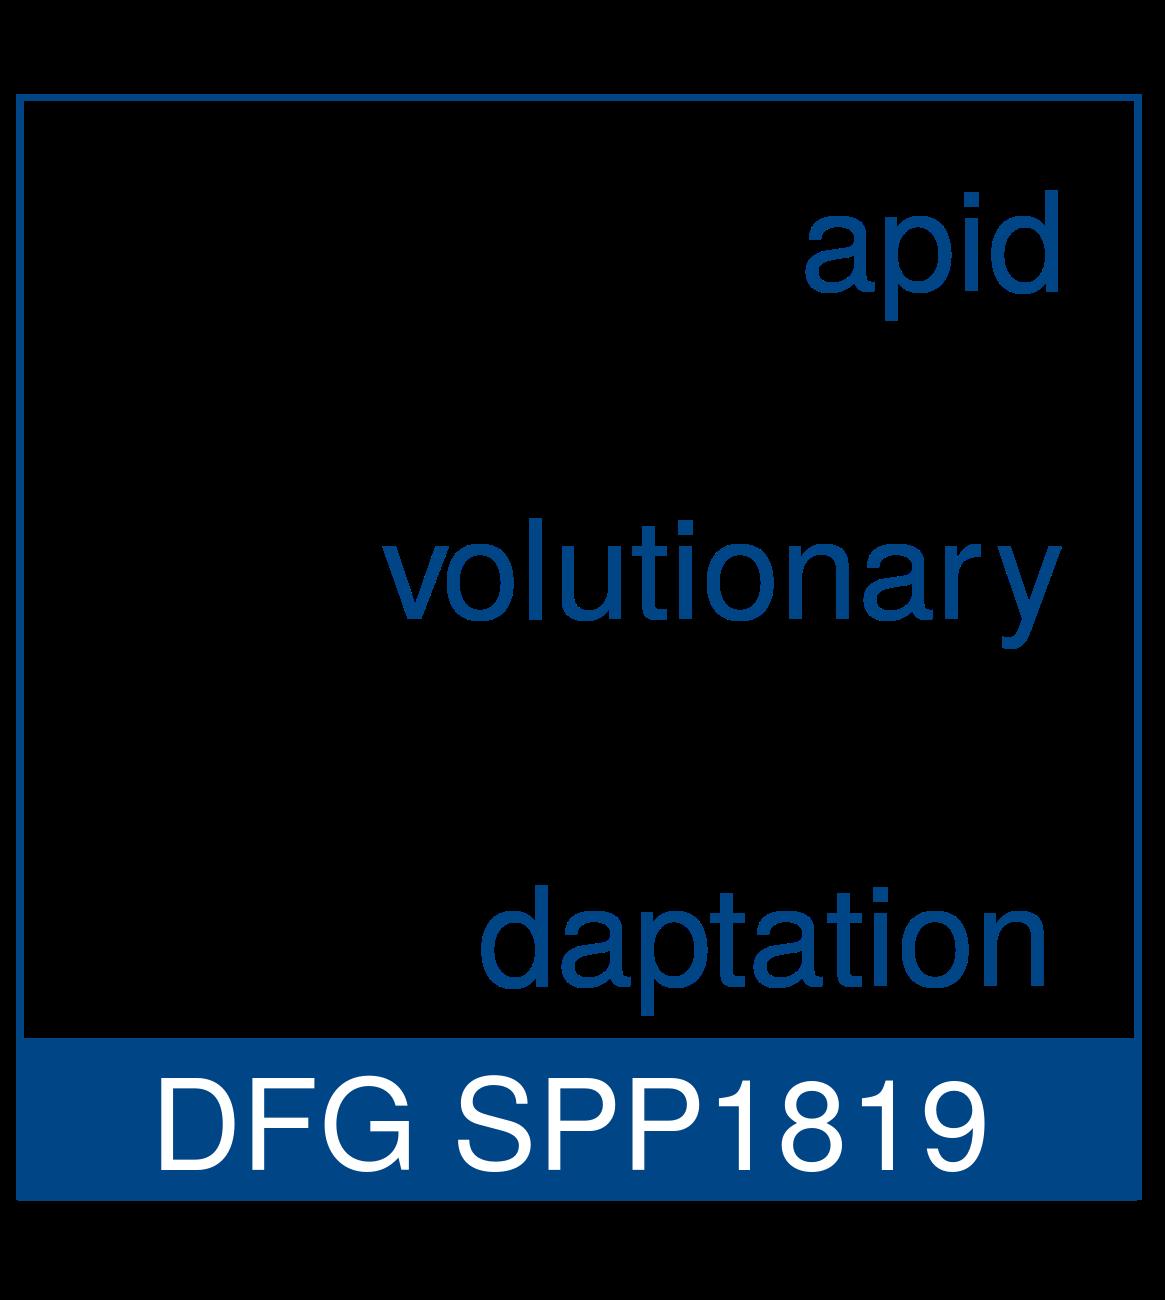 DFG SPP1819 - Rapid Evolutionary Adaptation.png